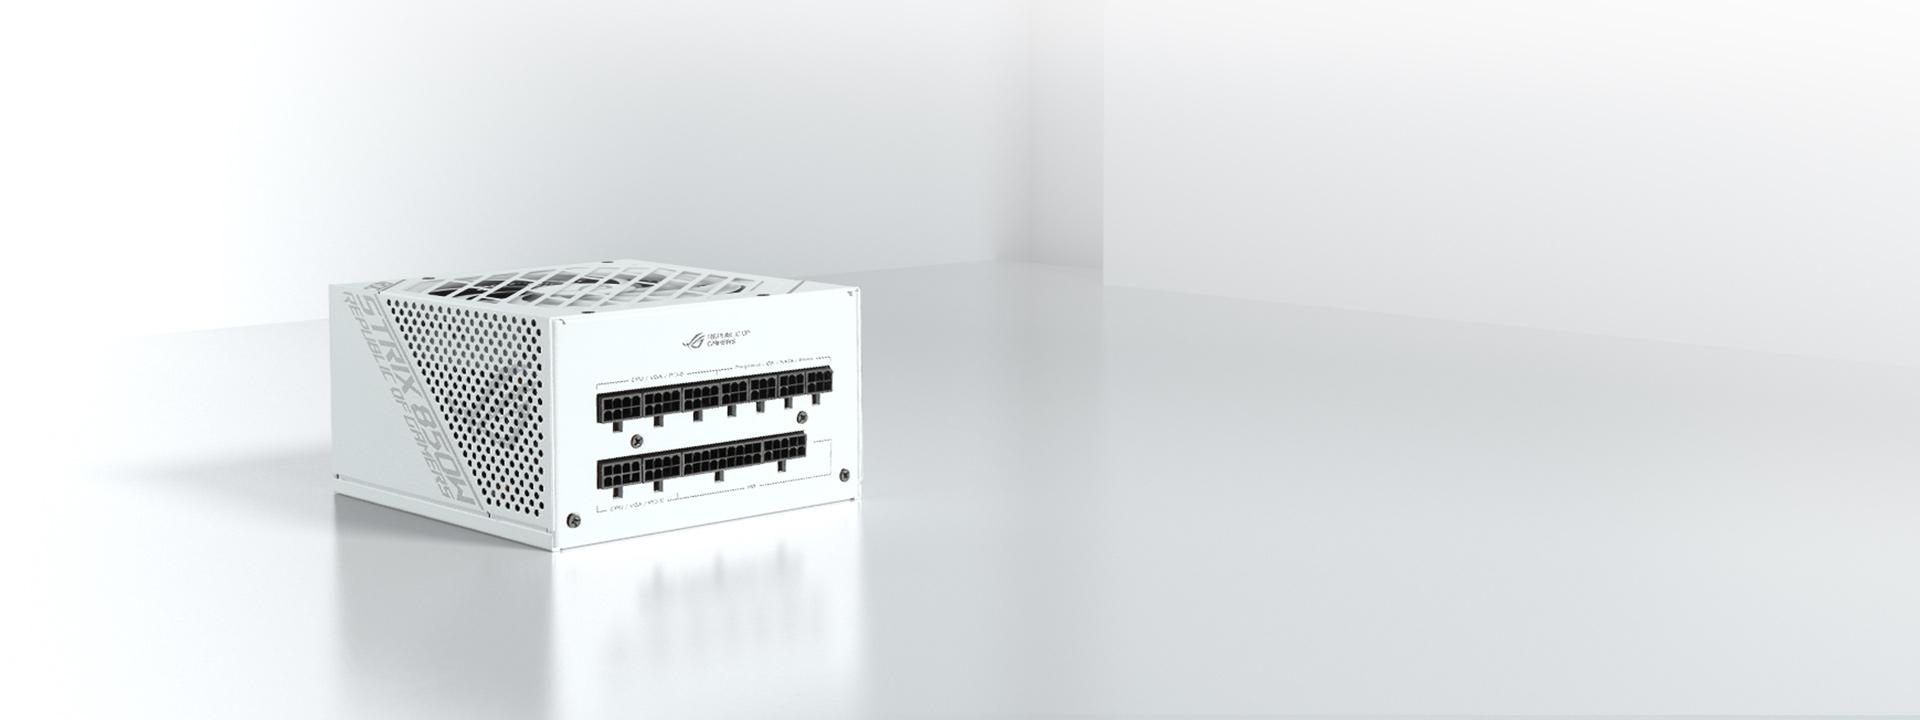 ROG Strix 850W金牌電源供應器具備標準黑色與限量的潮競白兩款風格配色,讓玩家輕鬆展示獨一無二的電競風格。